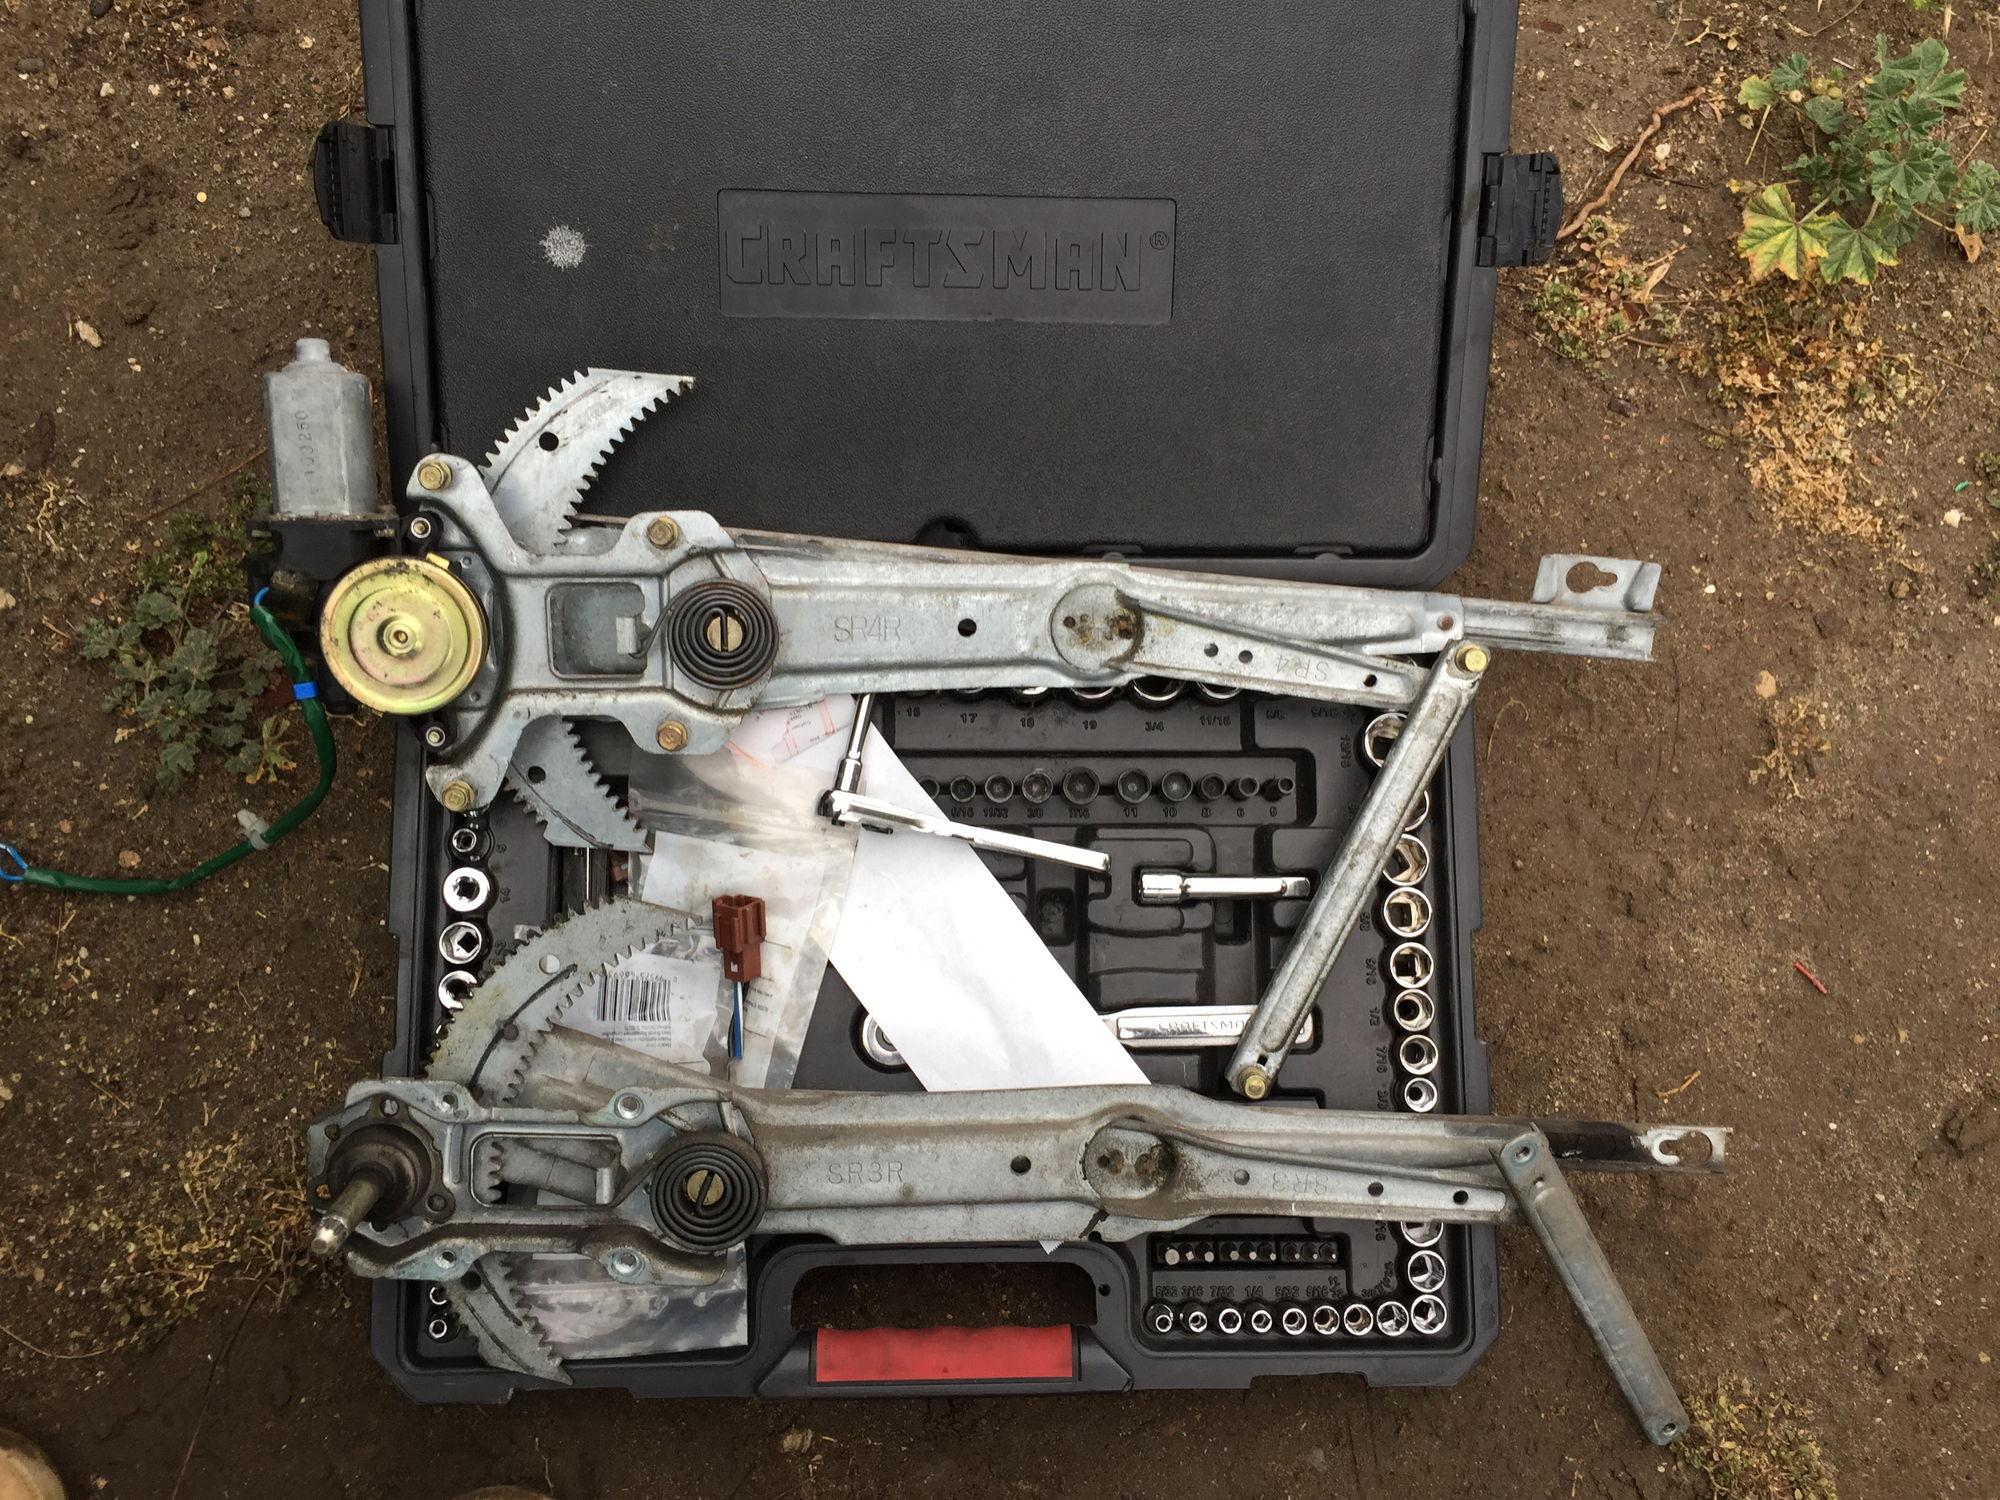 100 2000 honda civic manual window repair manual for 2000 honda accord power window repair